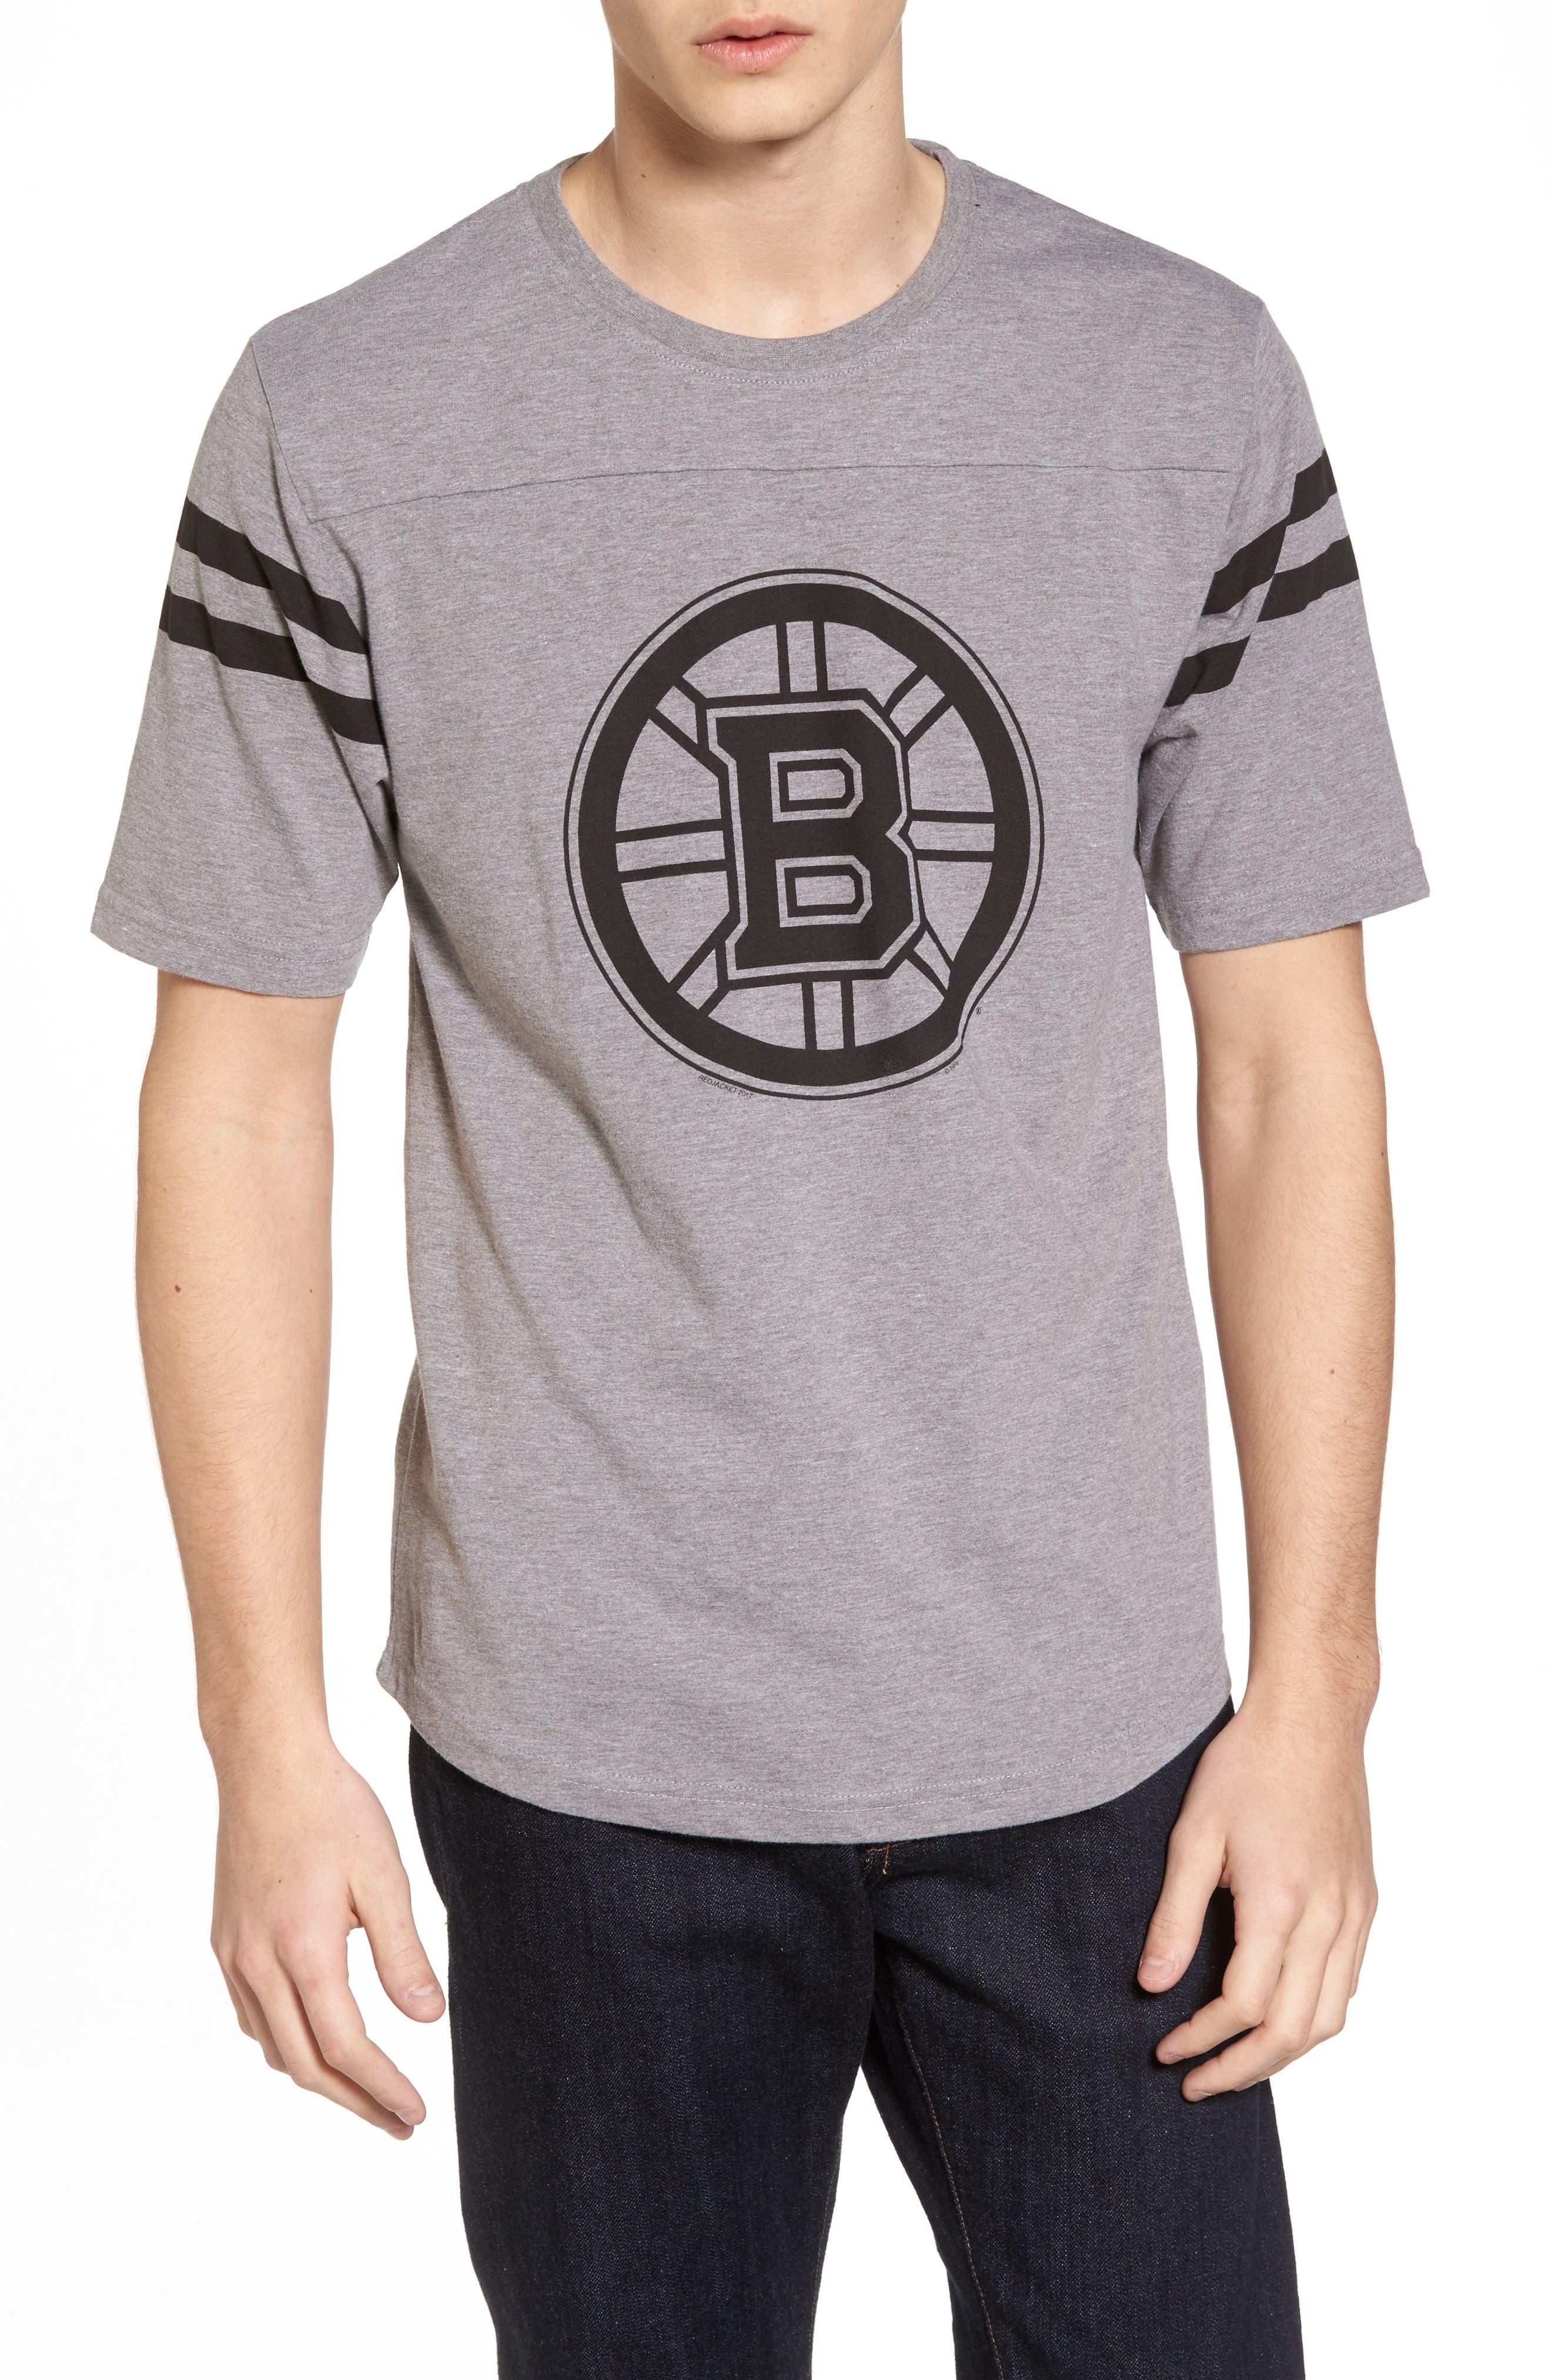 American Needle Crosby Boston Bruins T-Shirt